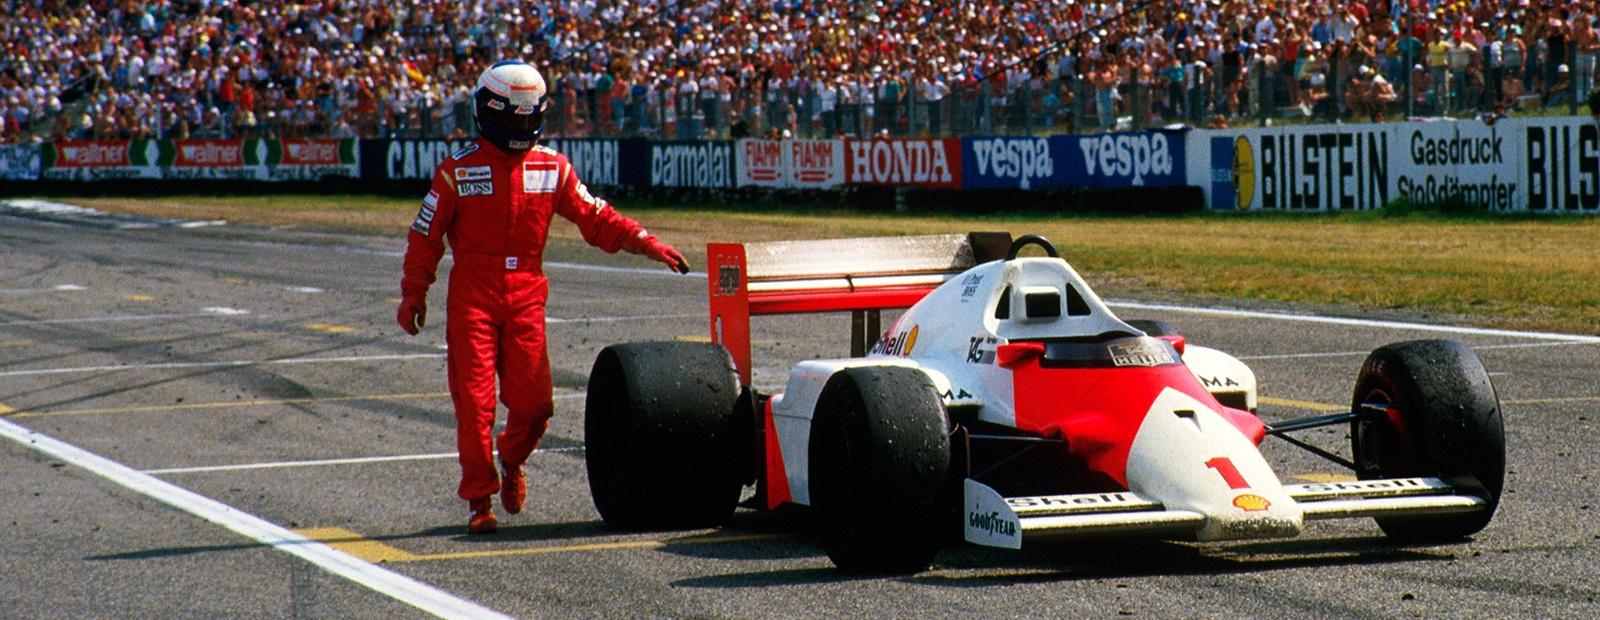 Det var sjelden Prost måtte bryte løp, men han måtte bryte Tyskland GP i 1987 som han ledet, bare fire runder før mål med tekniske problemer. Foto: McLaren